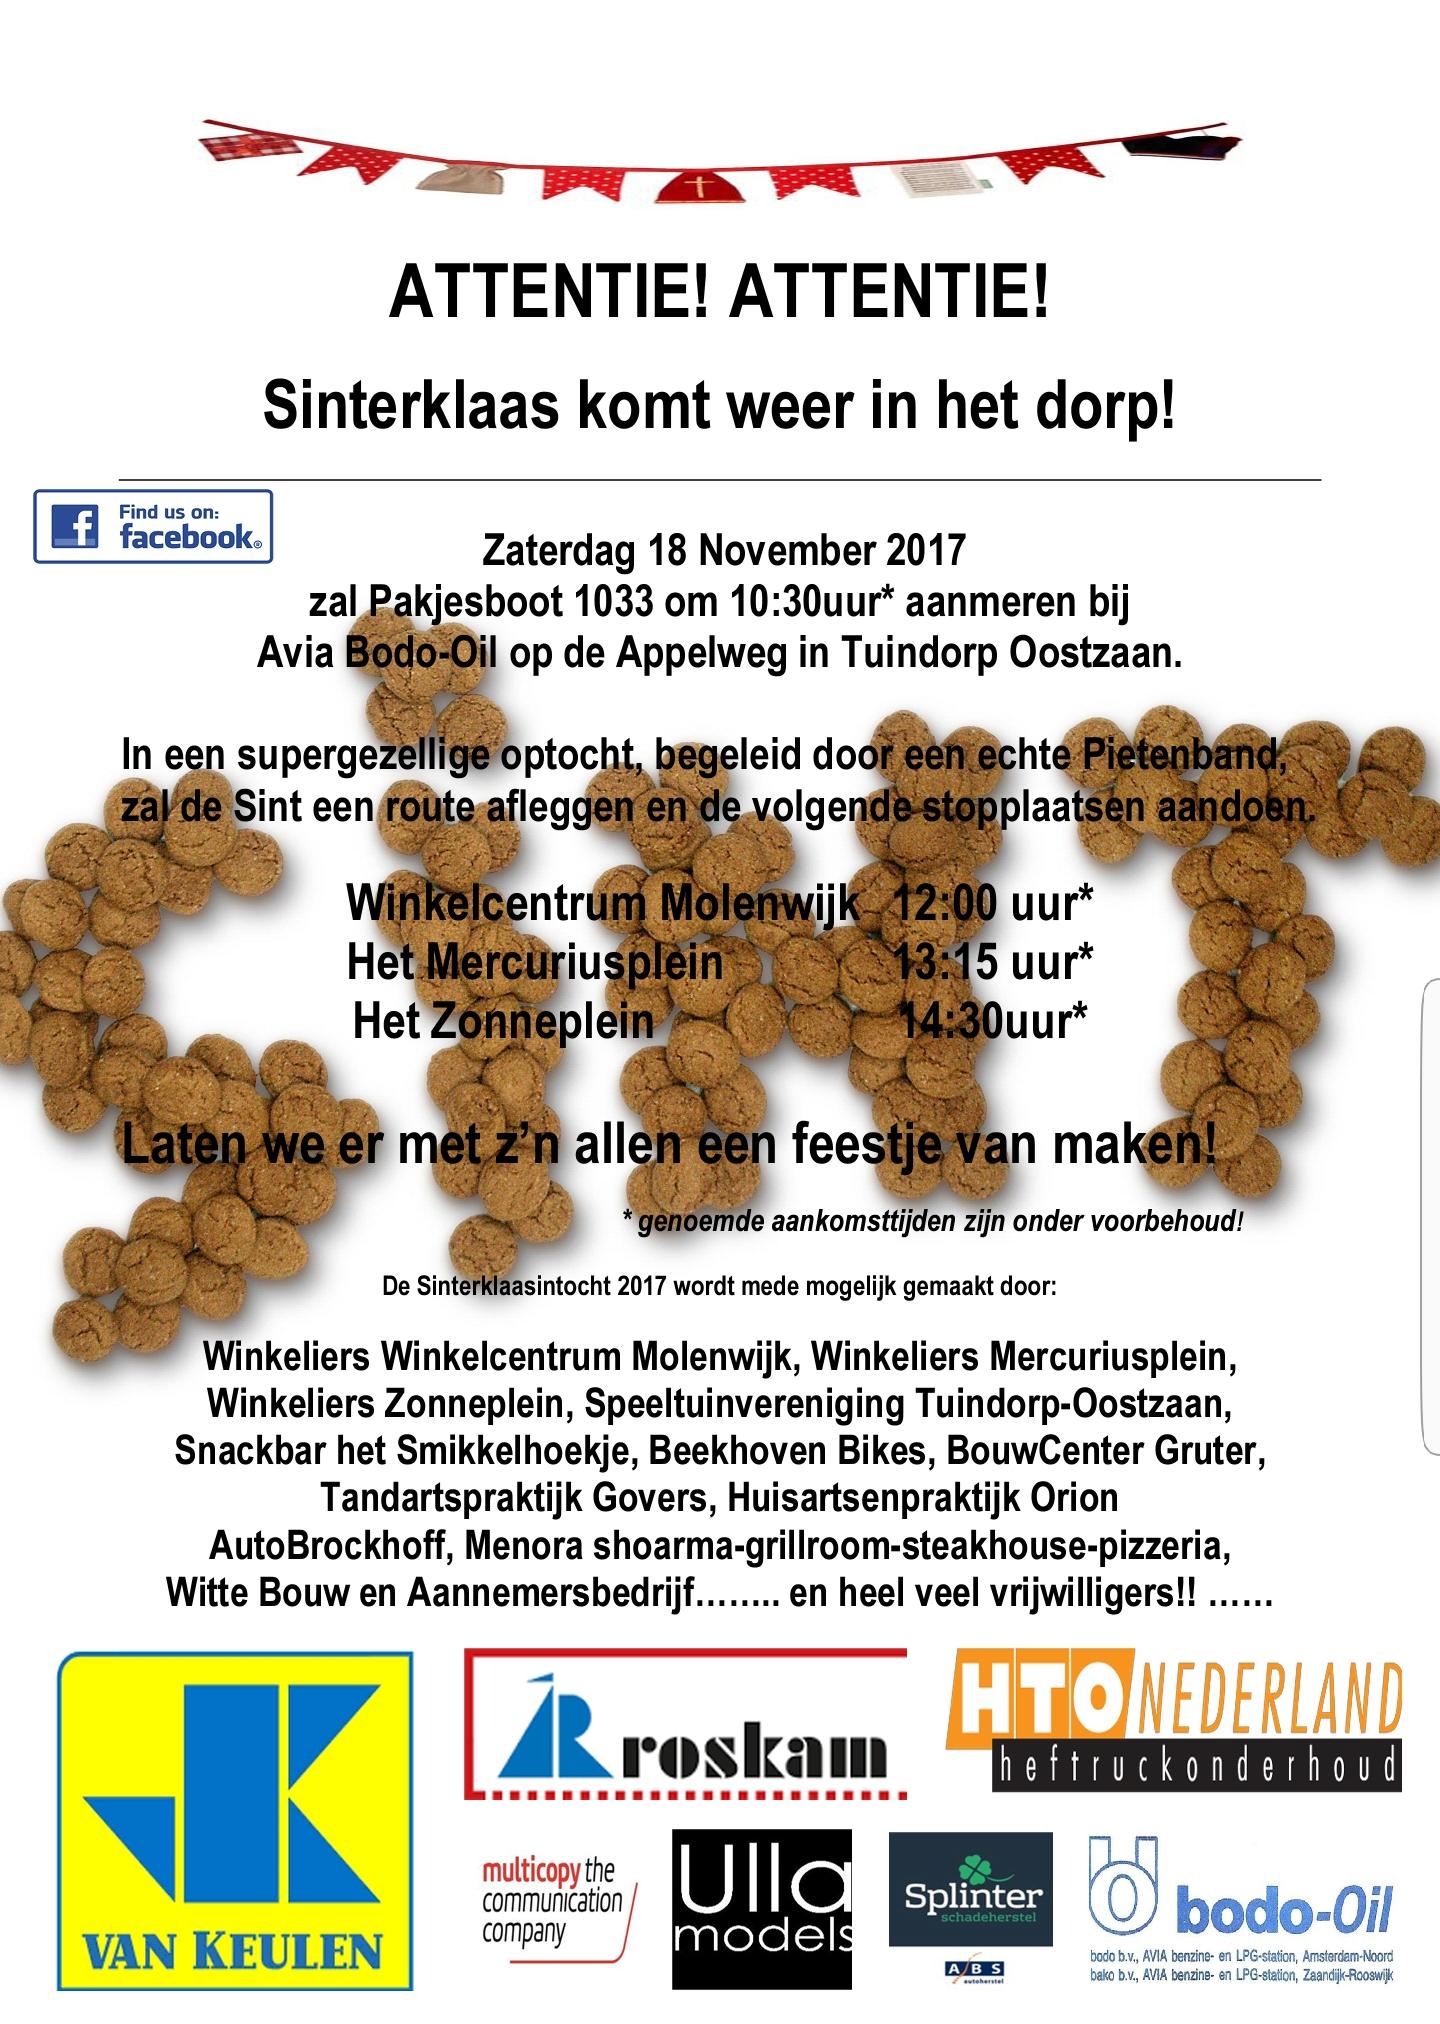 Sinterklaasintocht Amsterdam Noord Tuindorp Oostzaan